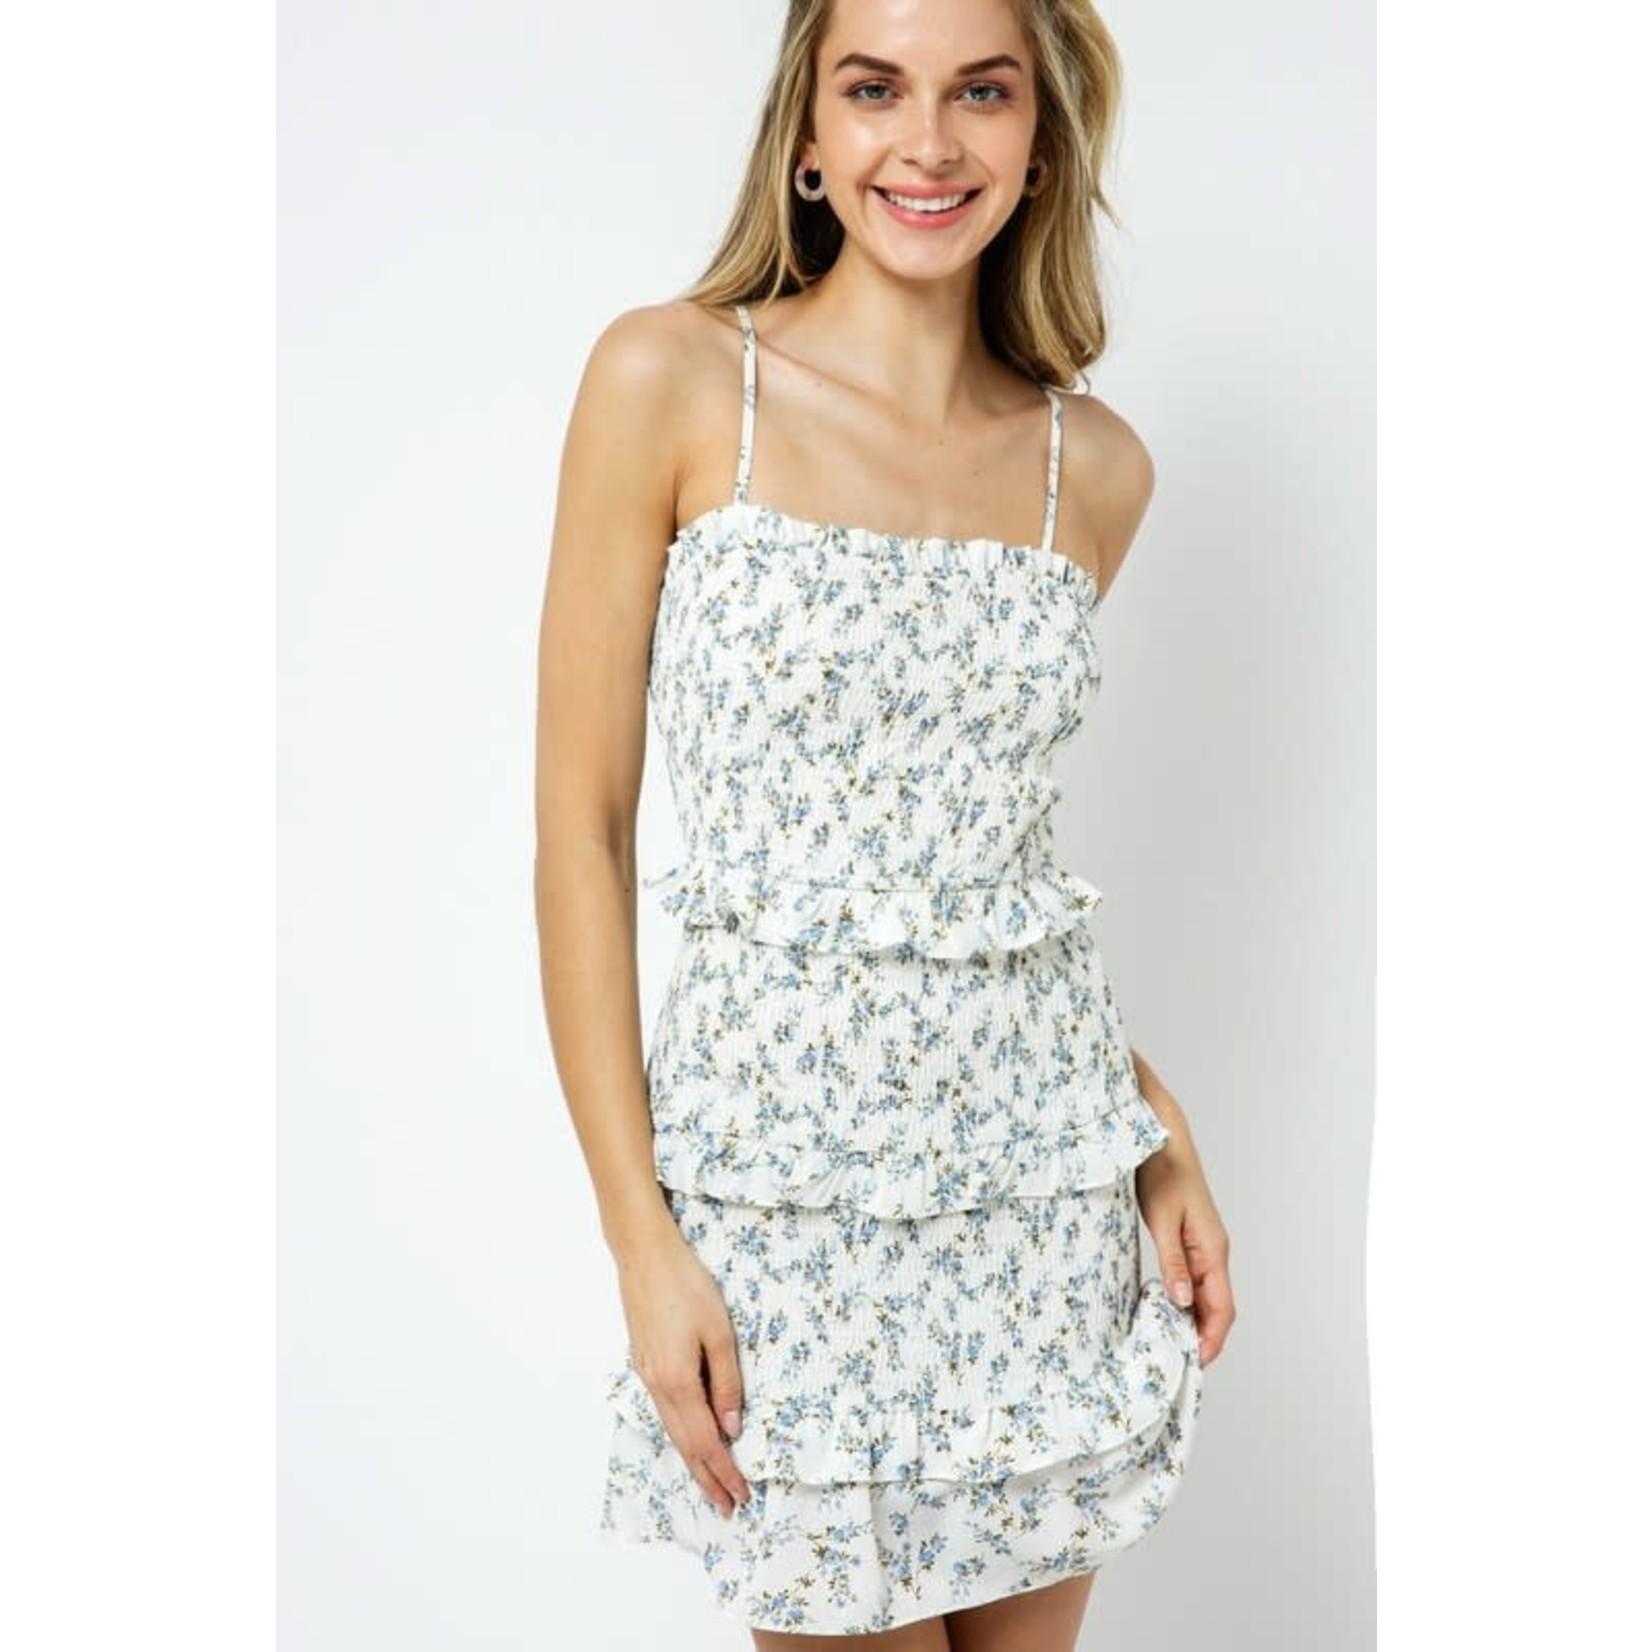 EM & ELLE Hanes Smocked Ruffled Dress